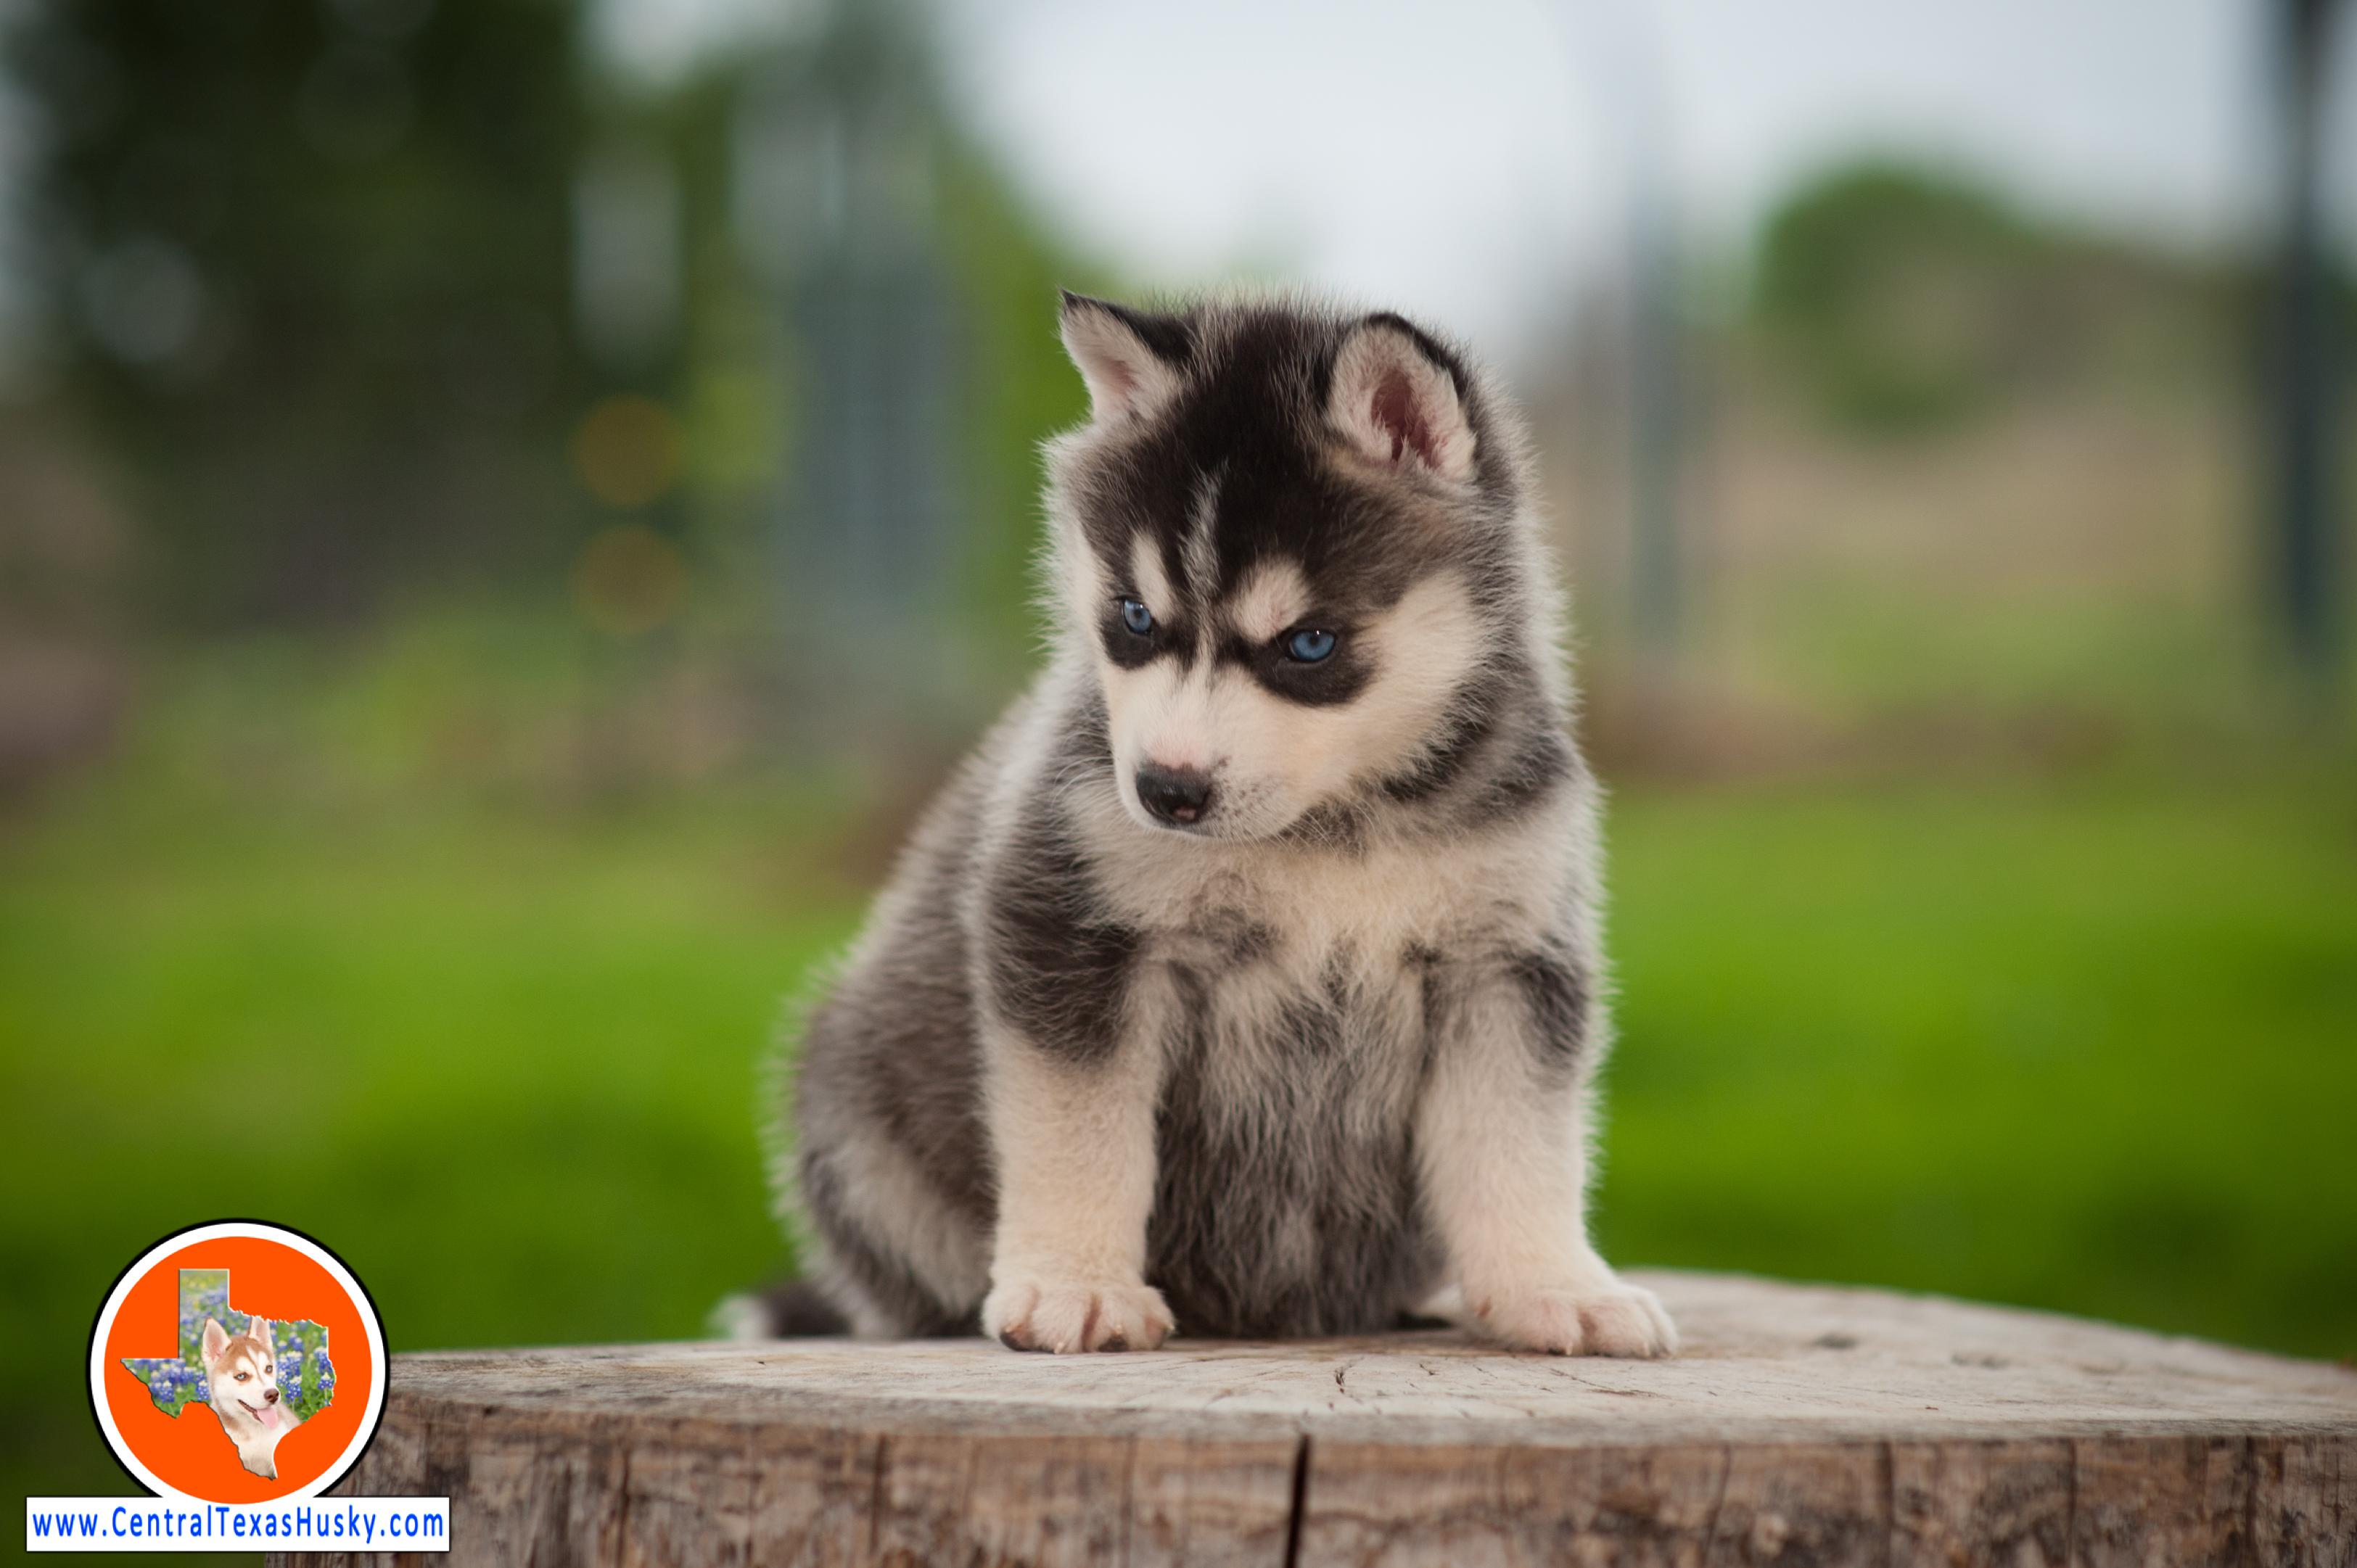 central-texas-husky_austin-siberian-husky-breeder_703960_20180324